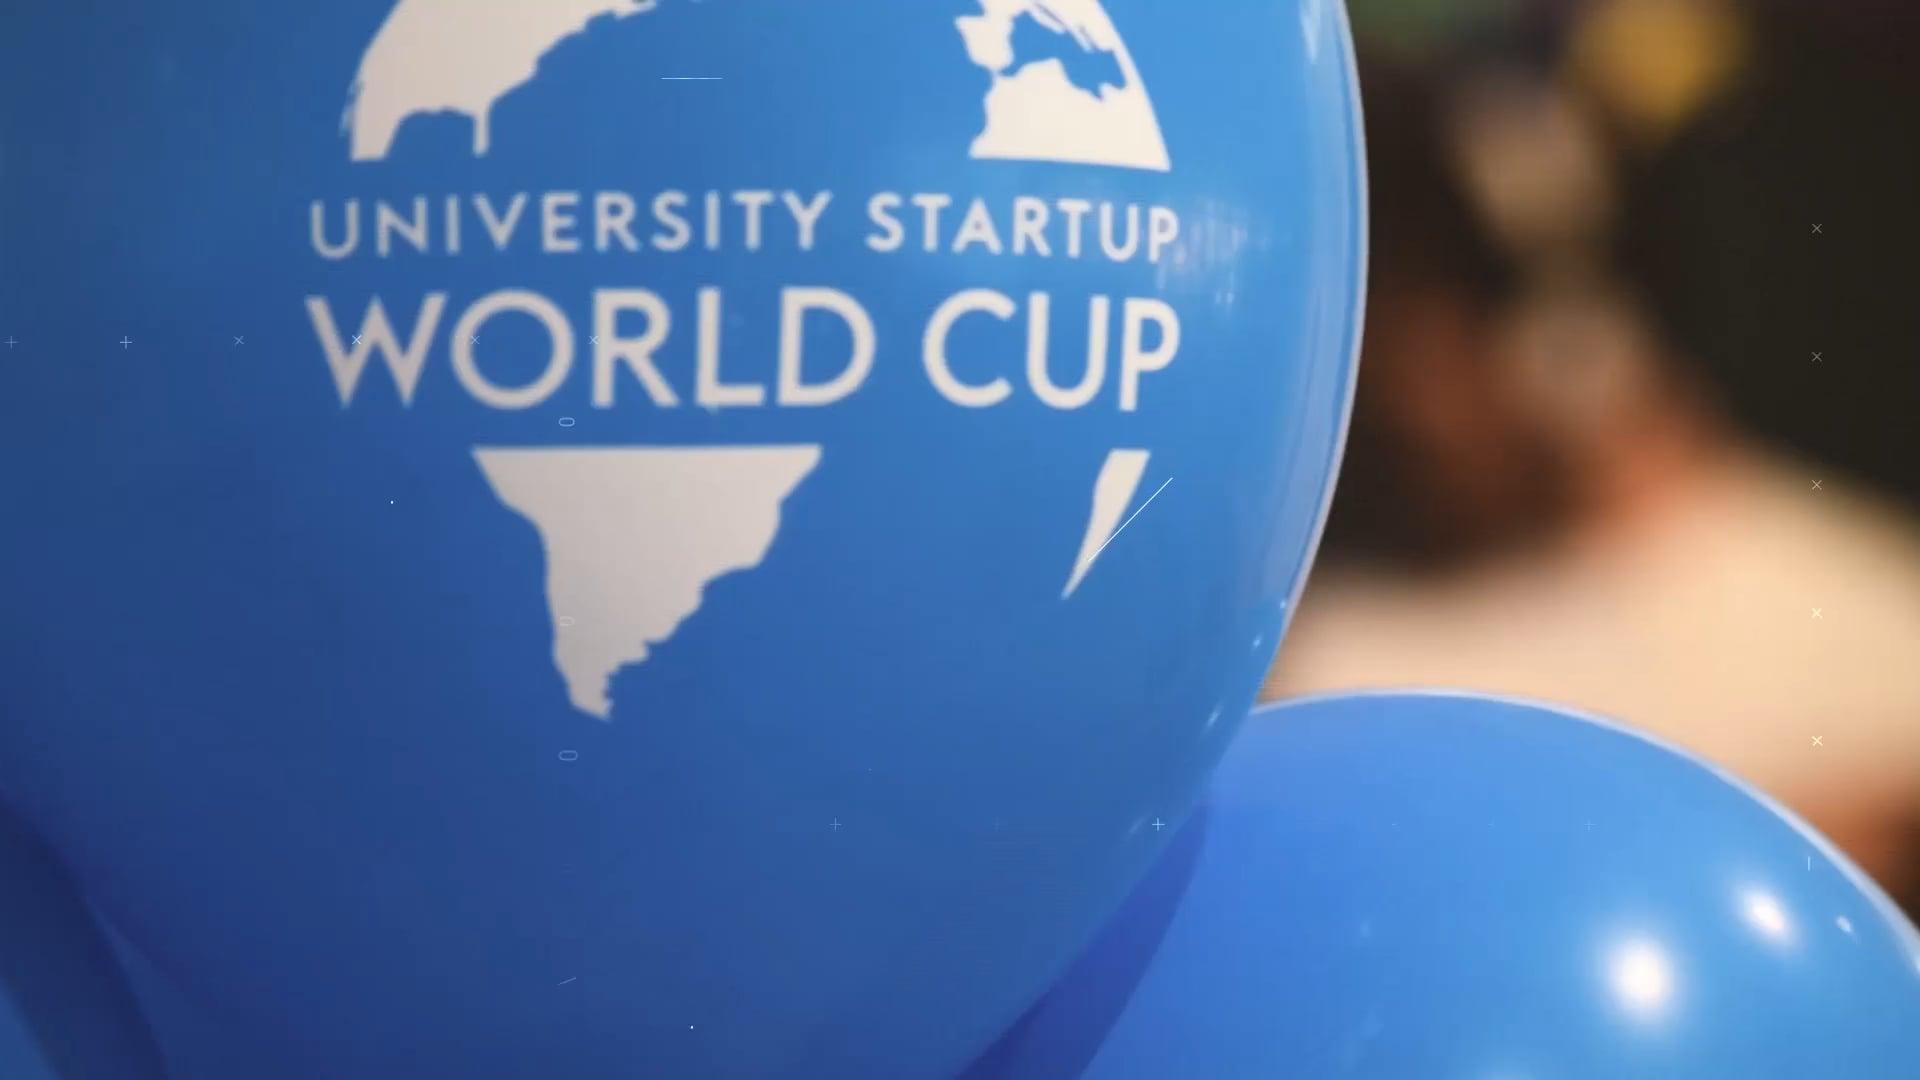 University Startup World Cup 2018 - Copenhagen